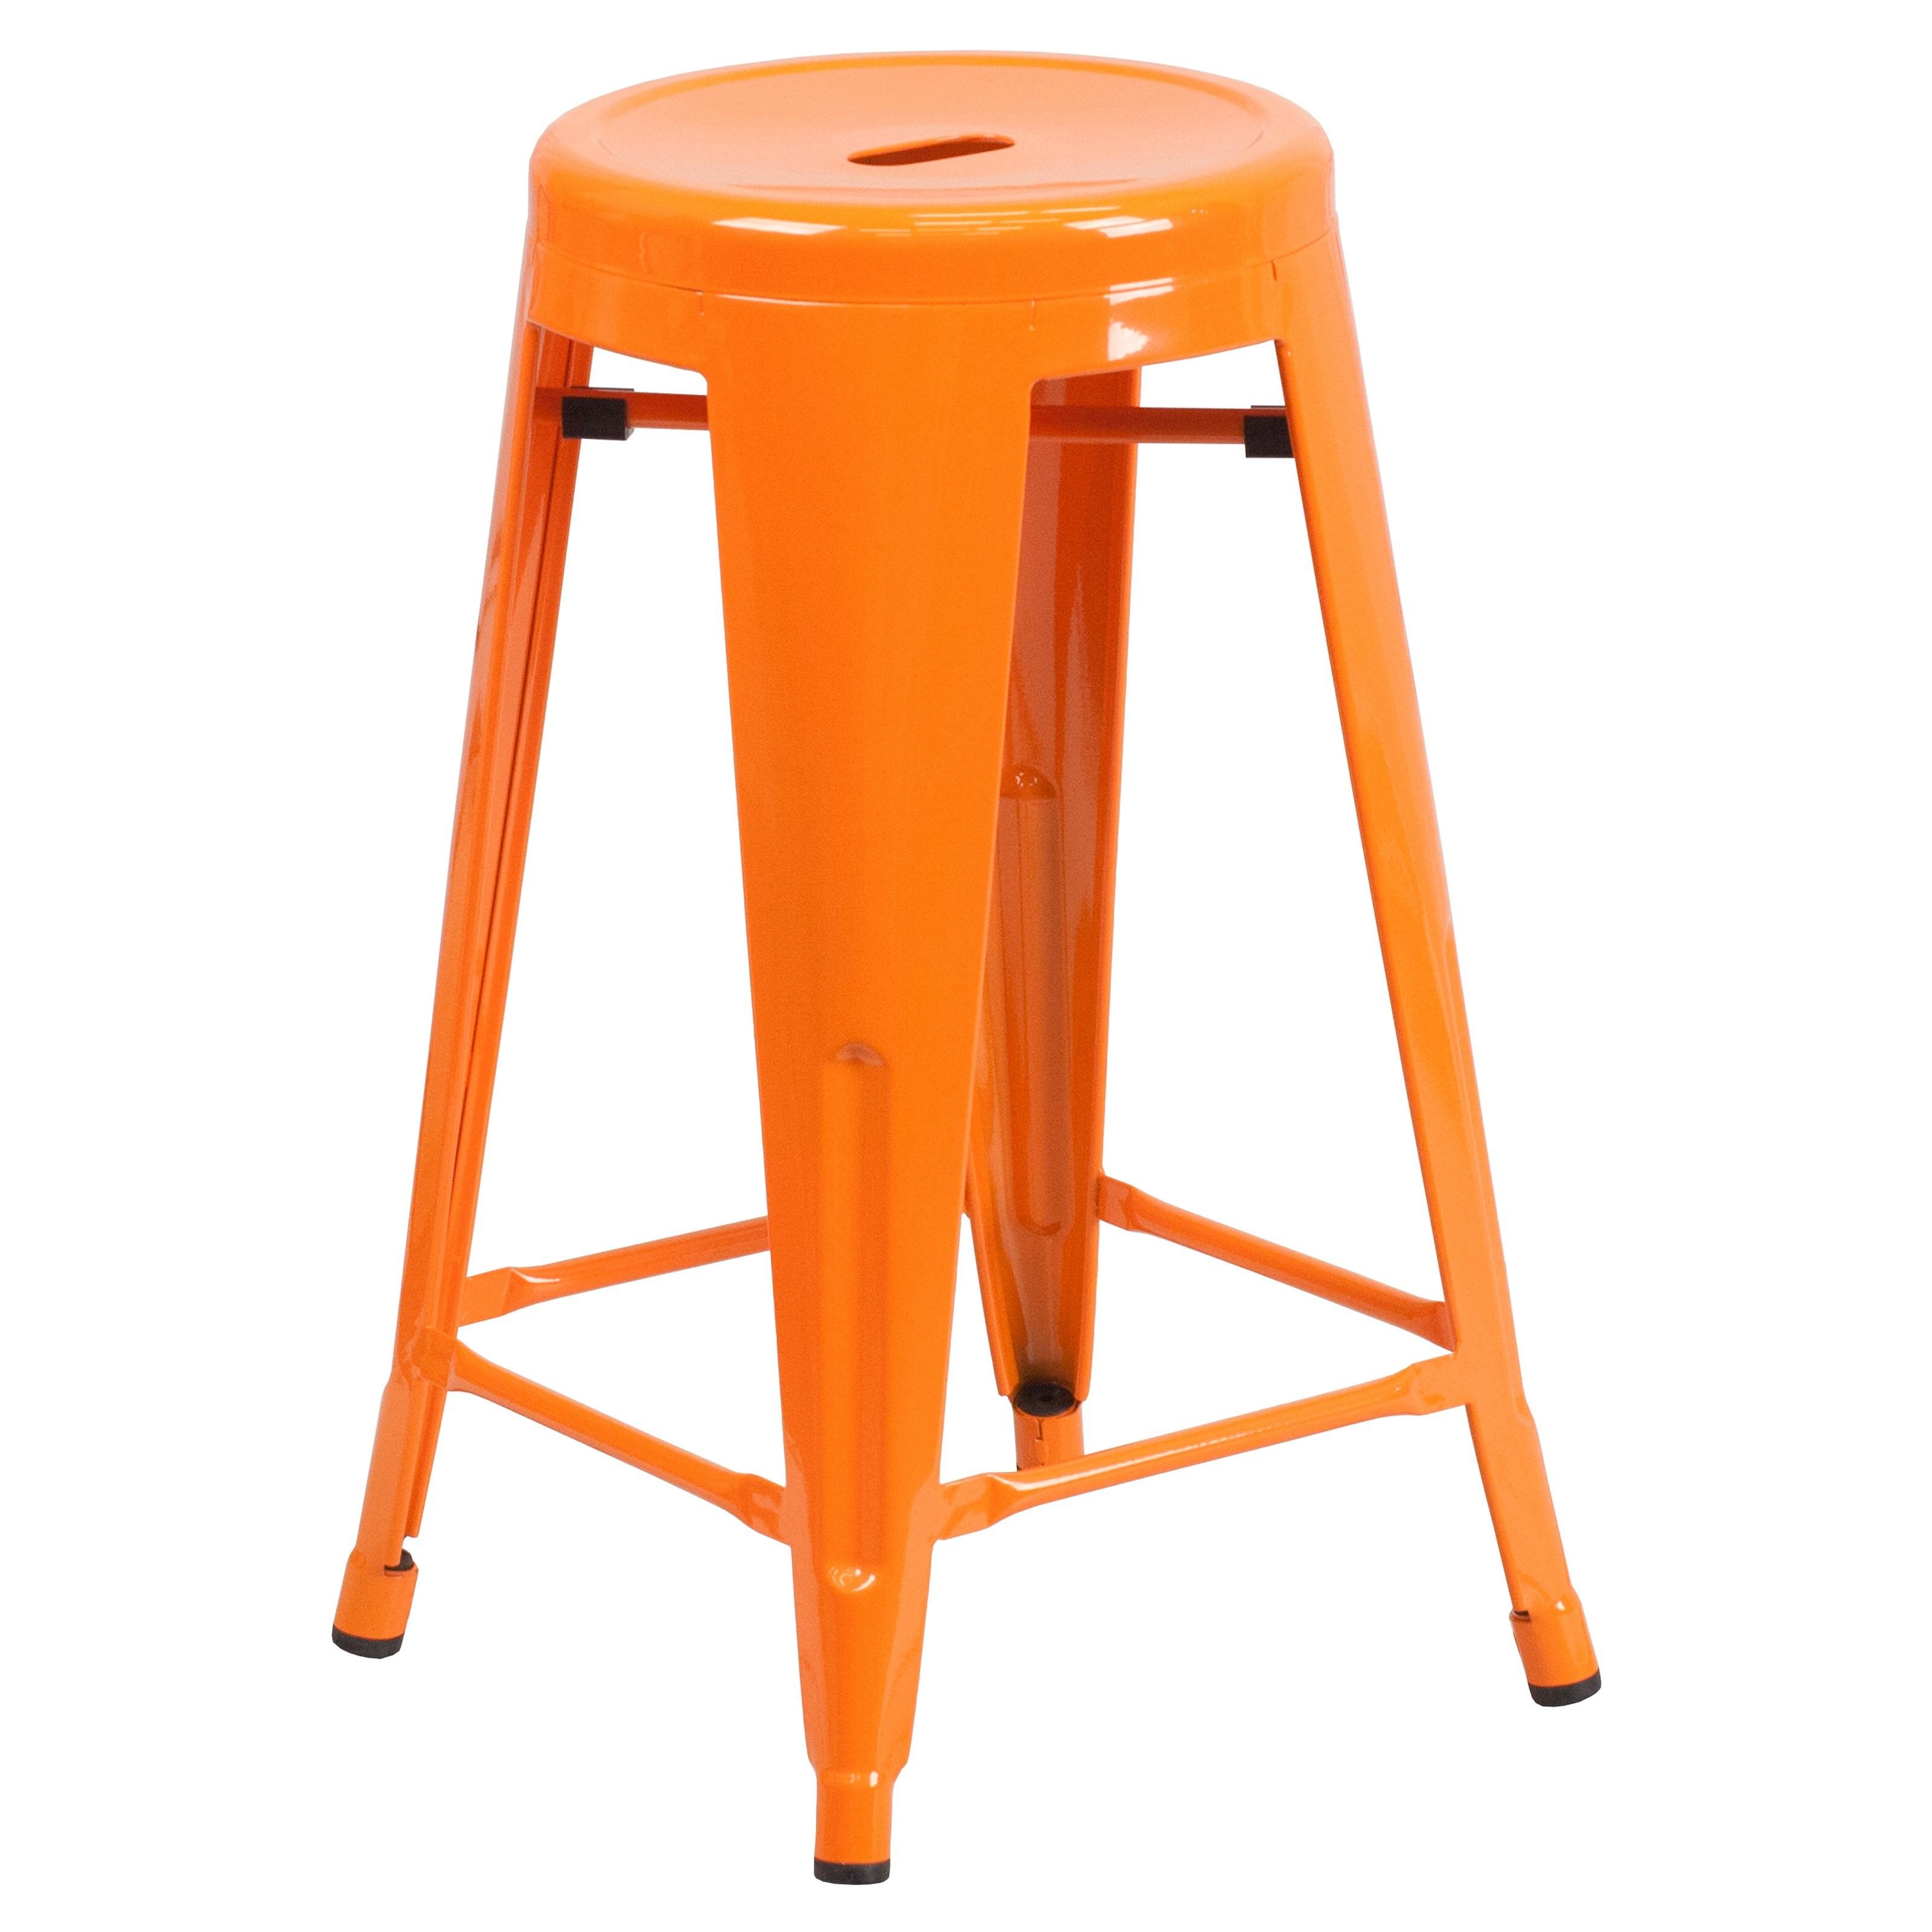 Miraculous Flash Furniture 24 High Backless Orange Metal Indoor Unemploymentrelief Wooden Chair Designs For Living Room Unemploymentrelieforg